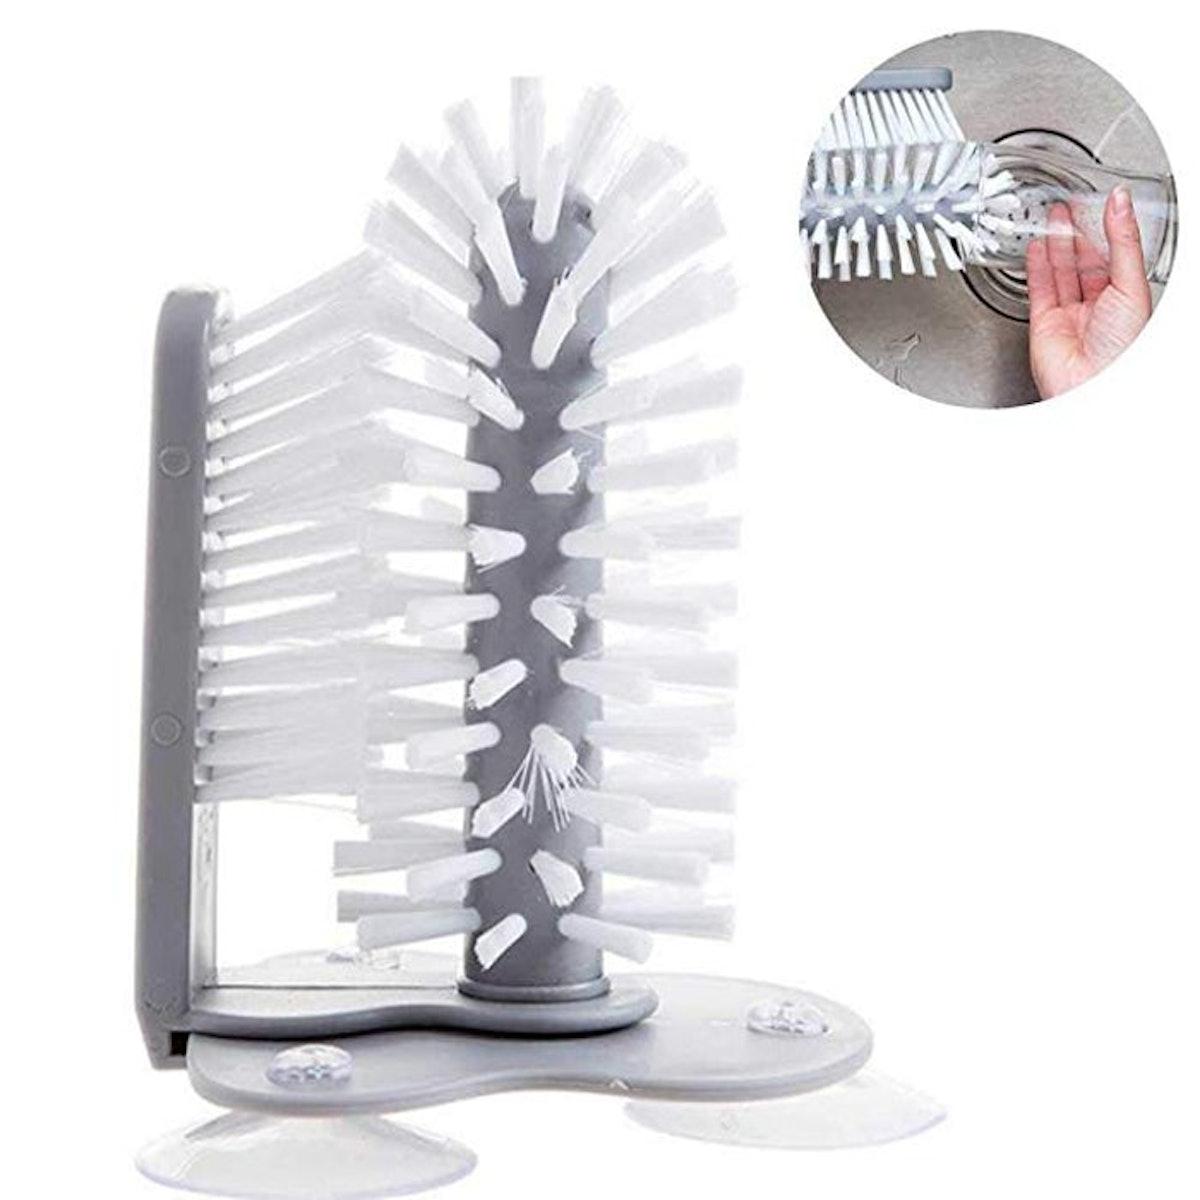 KOBWA Glass Washer with Double Sided Bristle Brush